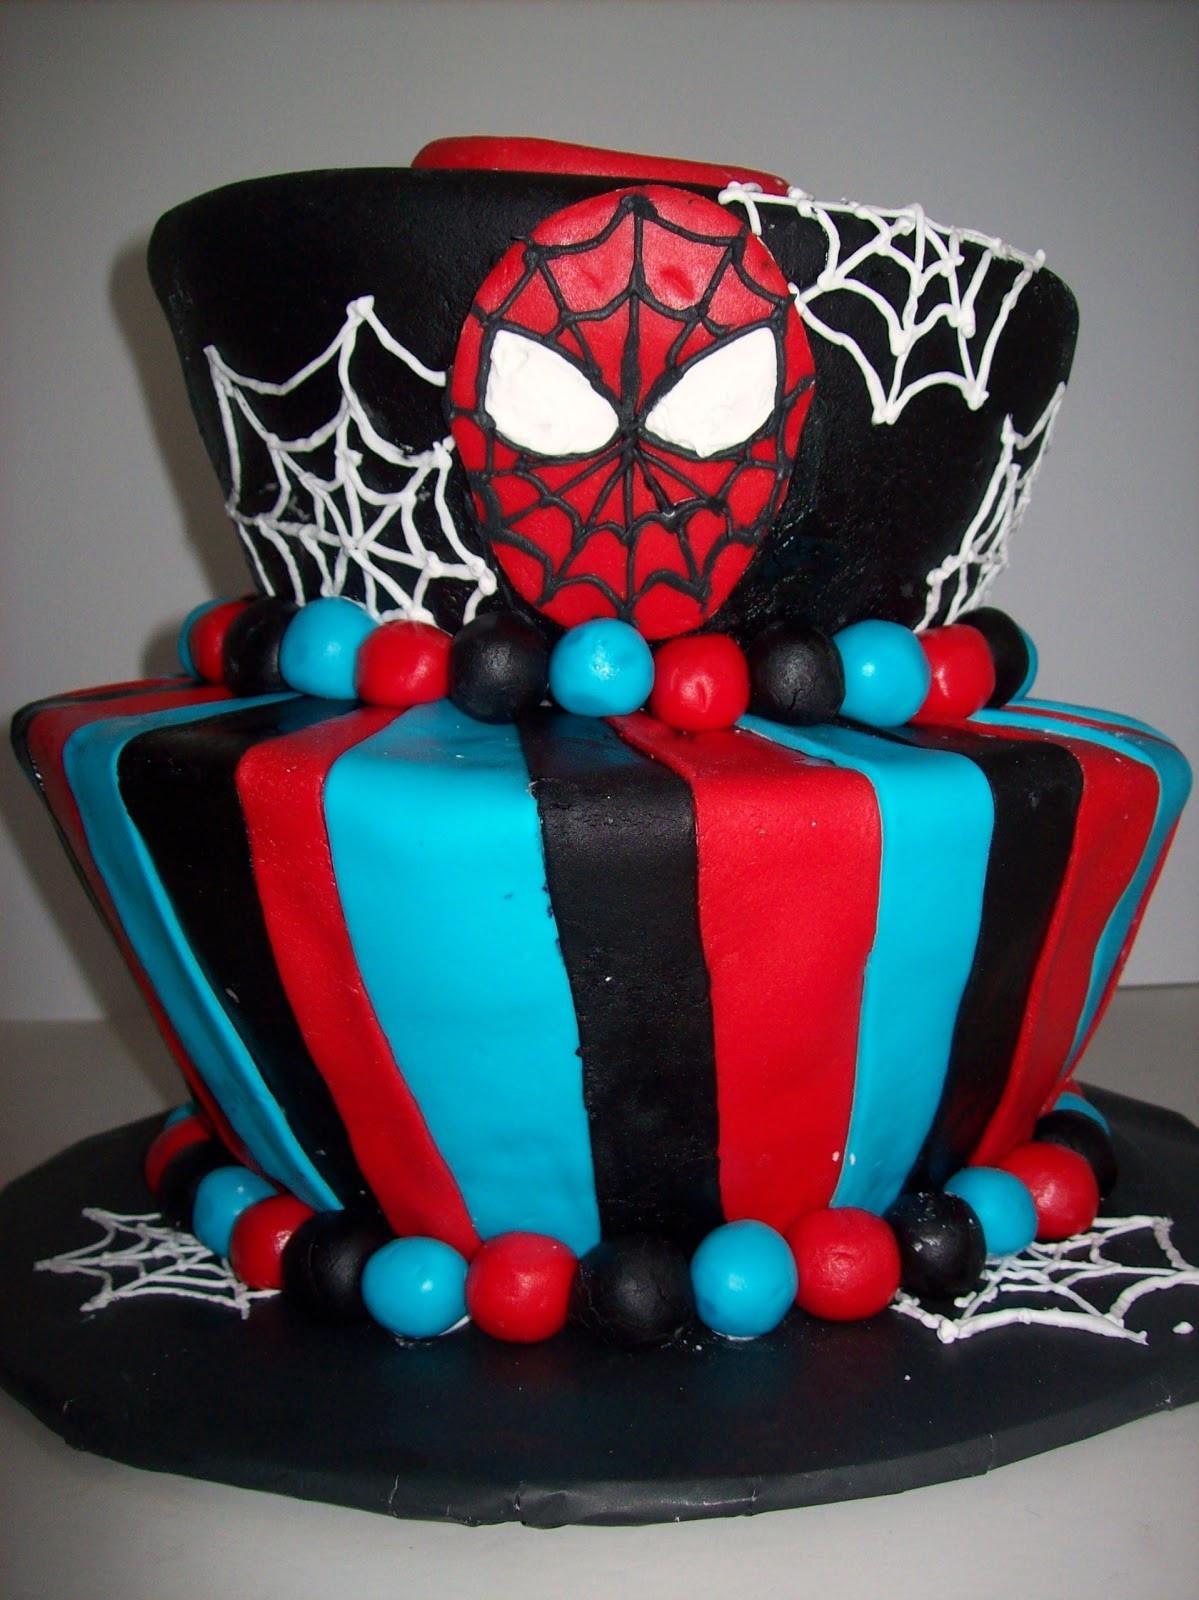 Spiderman Birthday Cakes  SAB Cakes Spiderman Birthday Cake